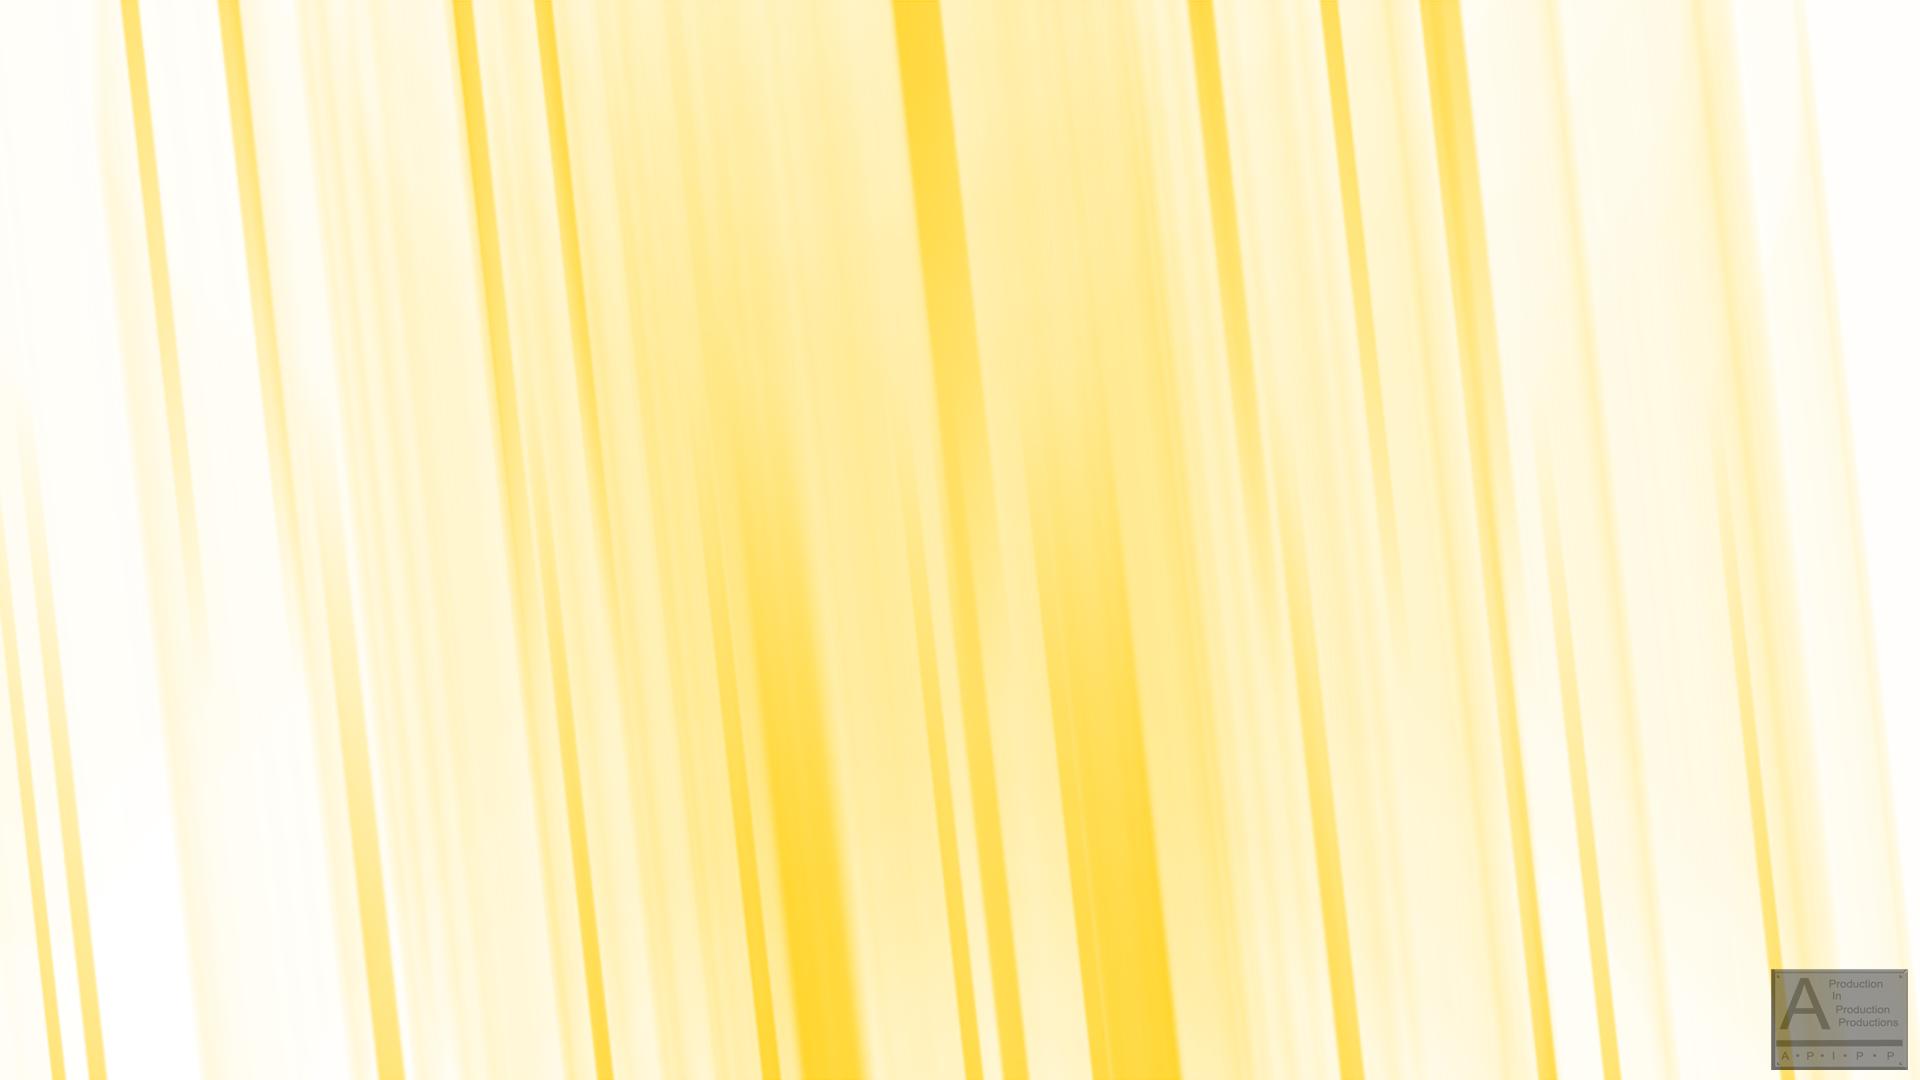 Light Yellow Wallpaper Yellow light stream 1920 x 1920x1080